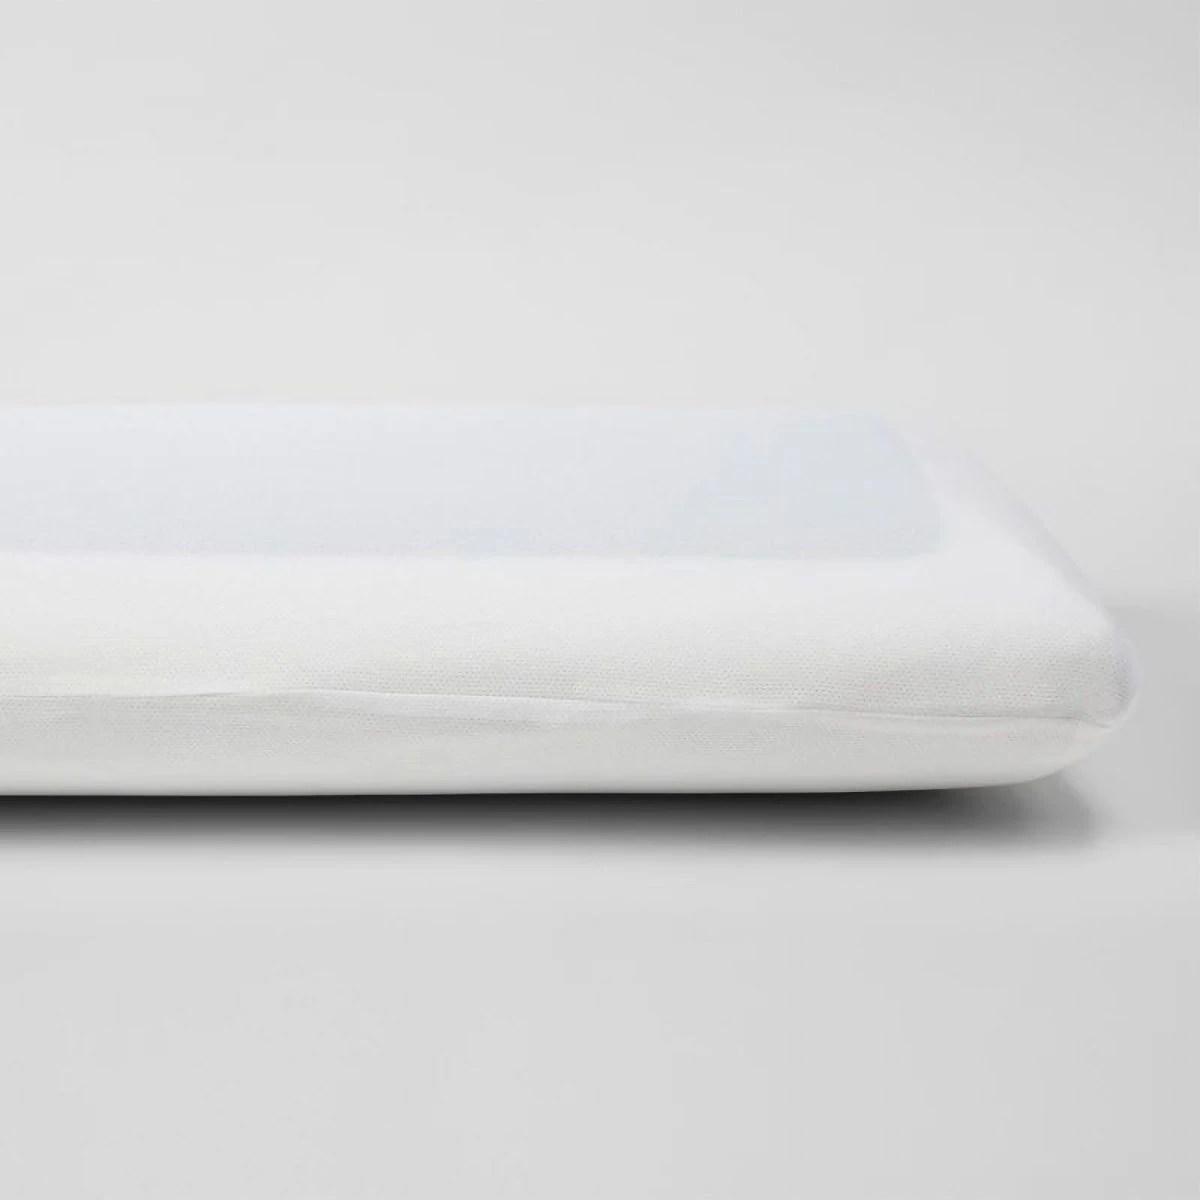 therapillo cooling gel top premium memory foam medium profile pillow